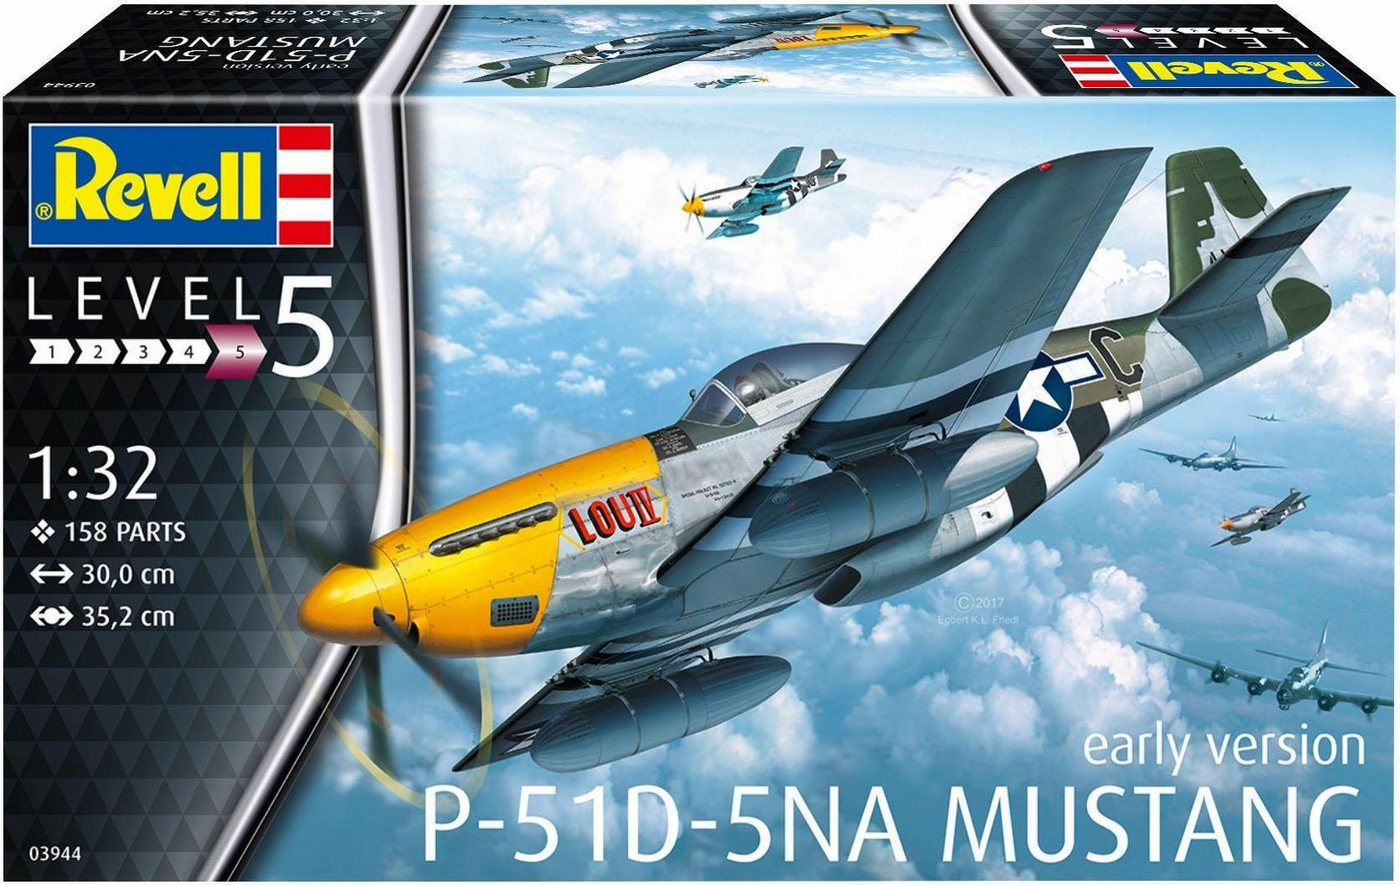 Revell Modellbausatz Flugzeug, »P-51D Mustang«